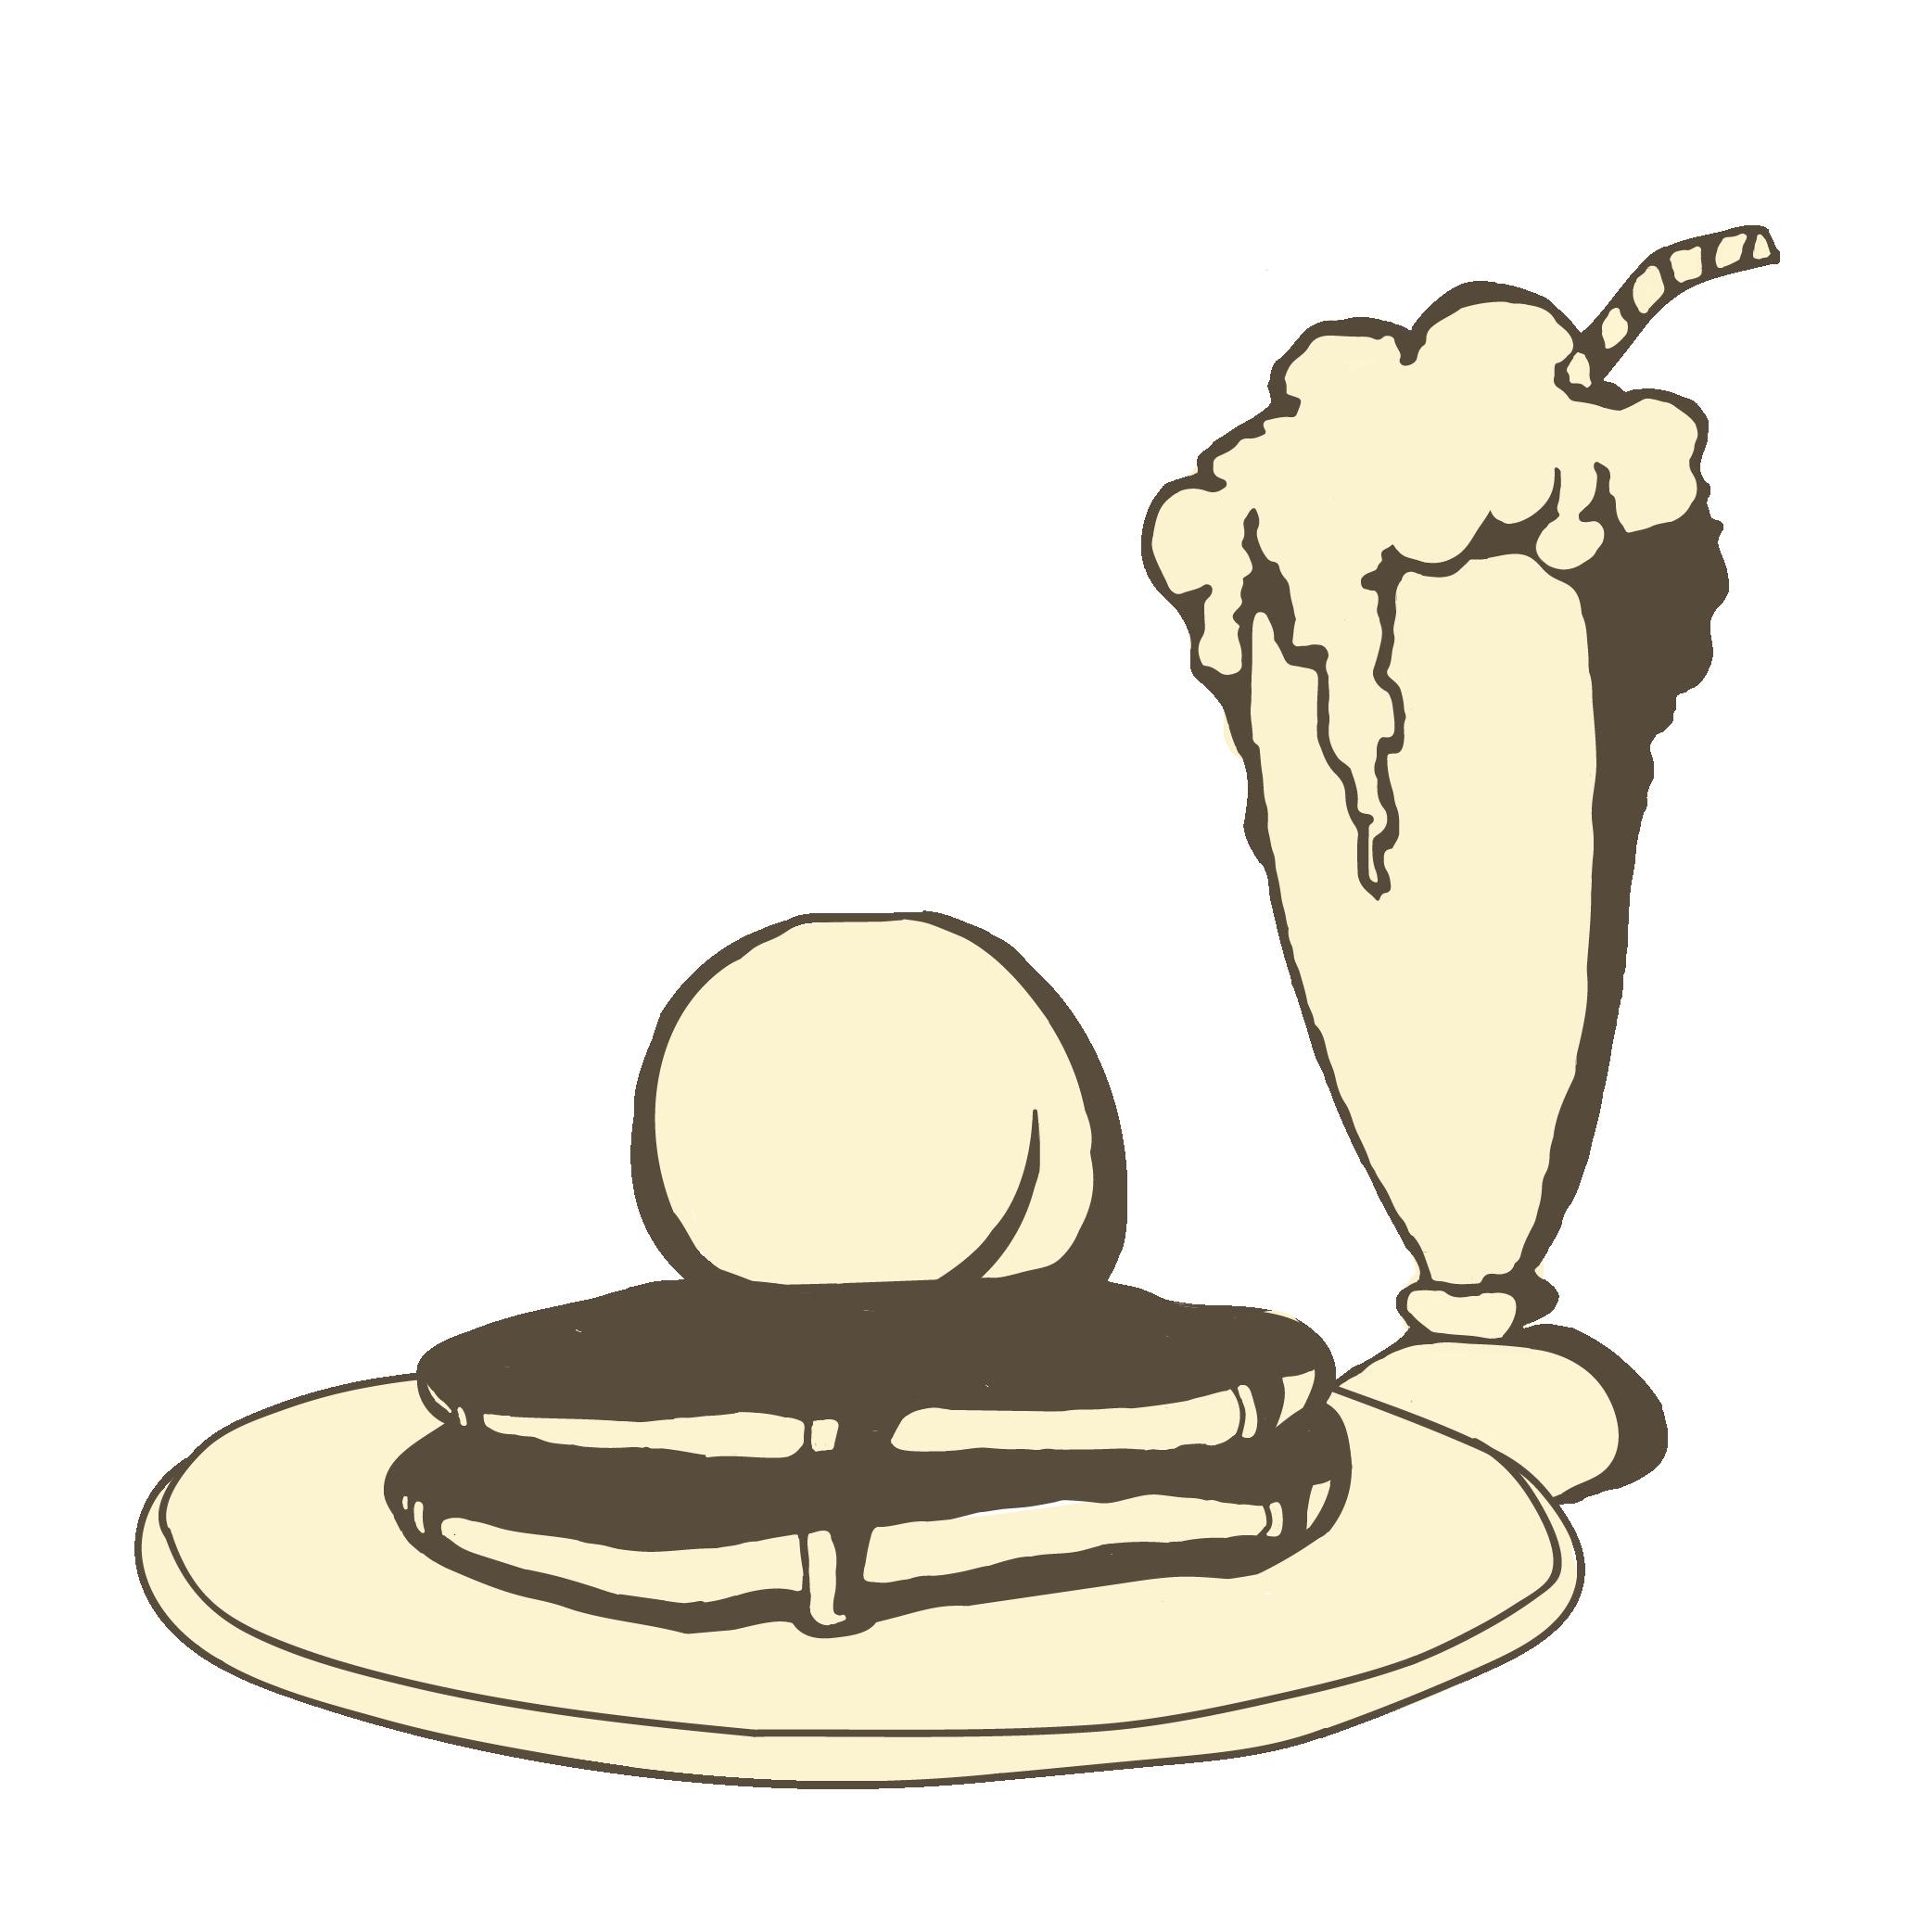 Pancake clipart full stack. Rewards the parlour get